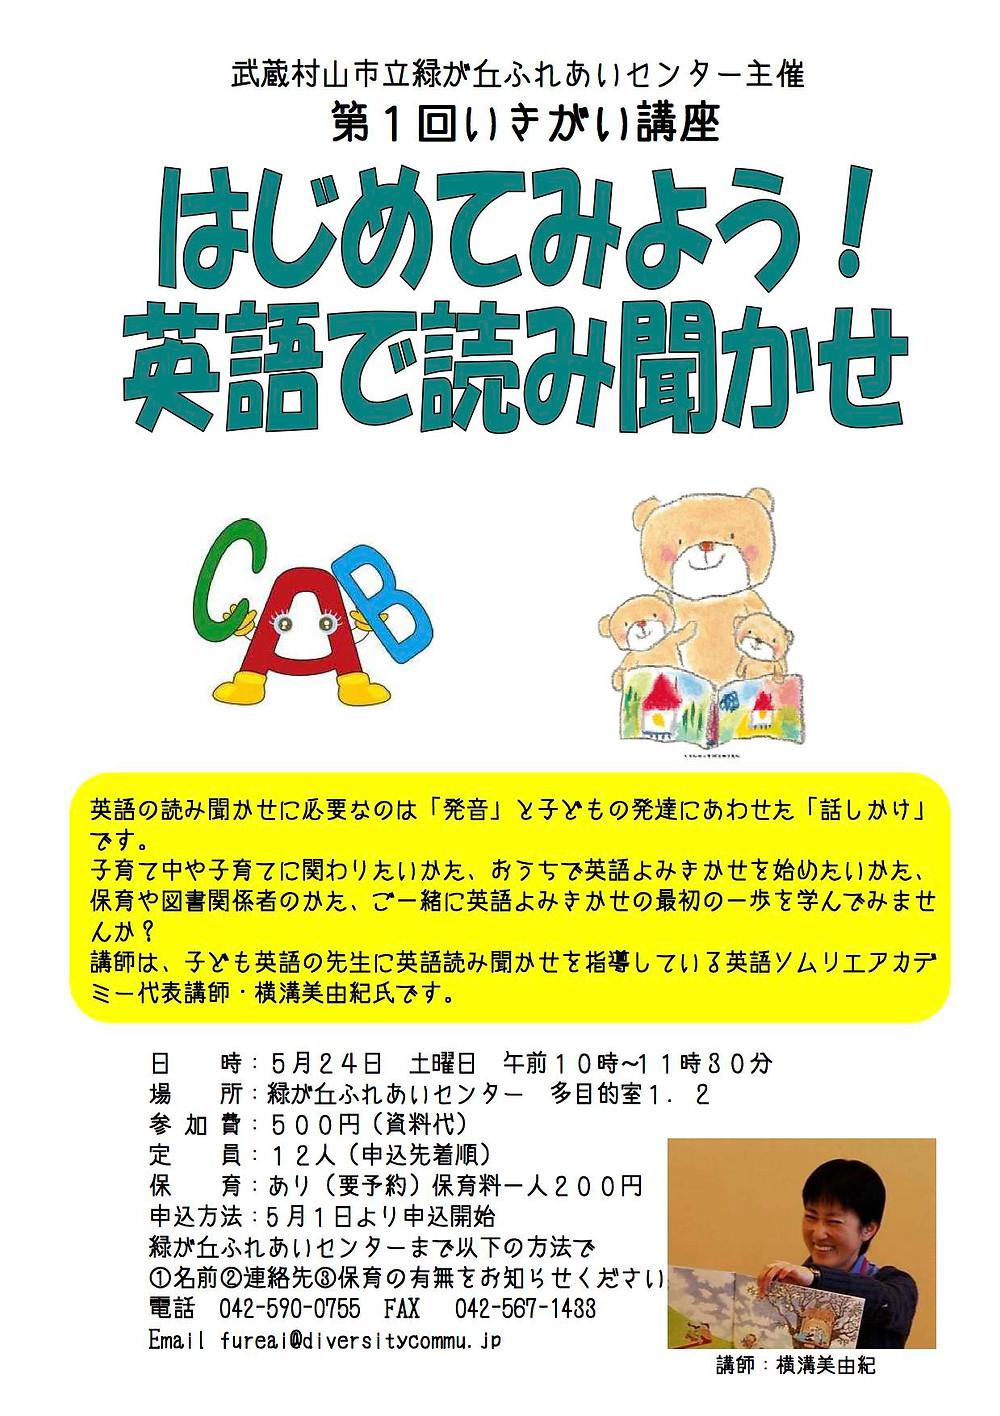 Microsoft Word - 英語読み聞かせ.jpg